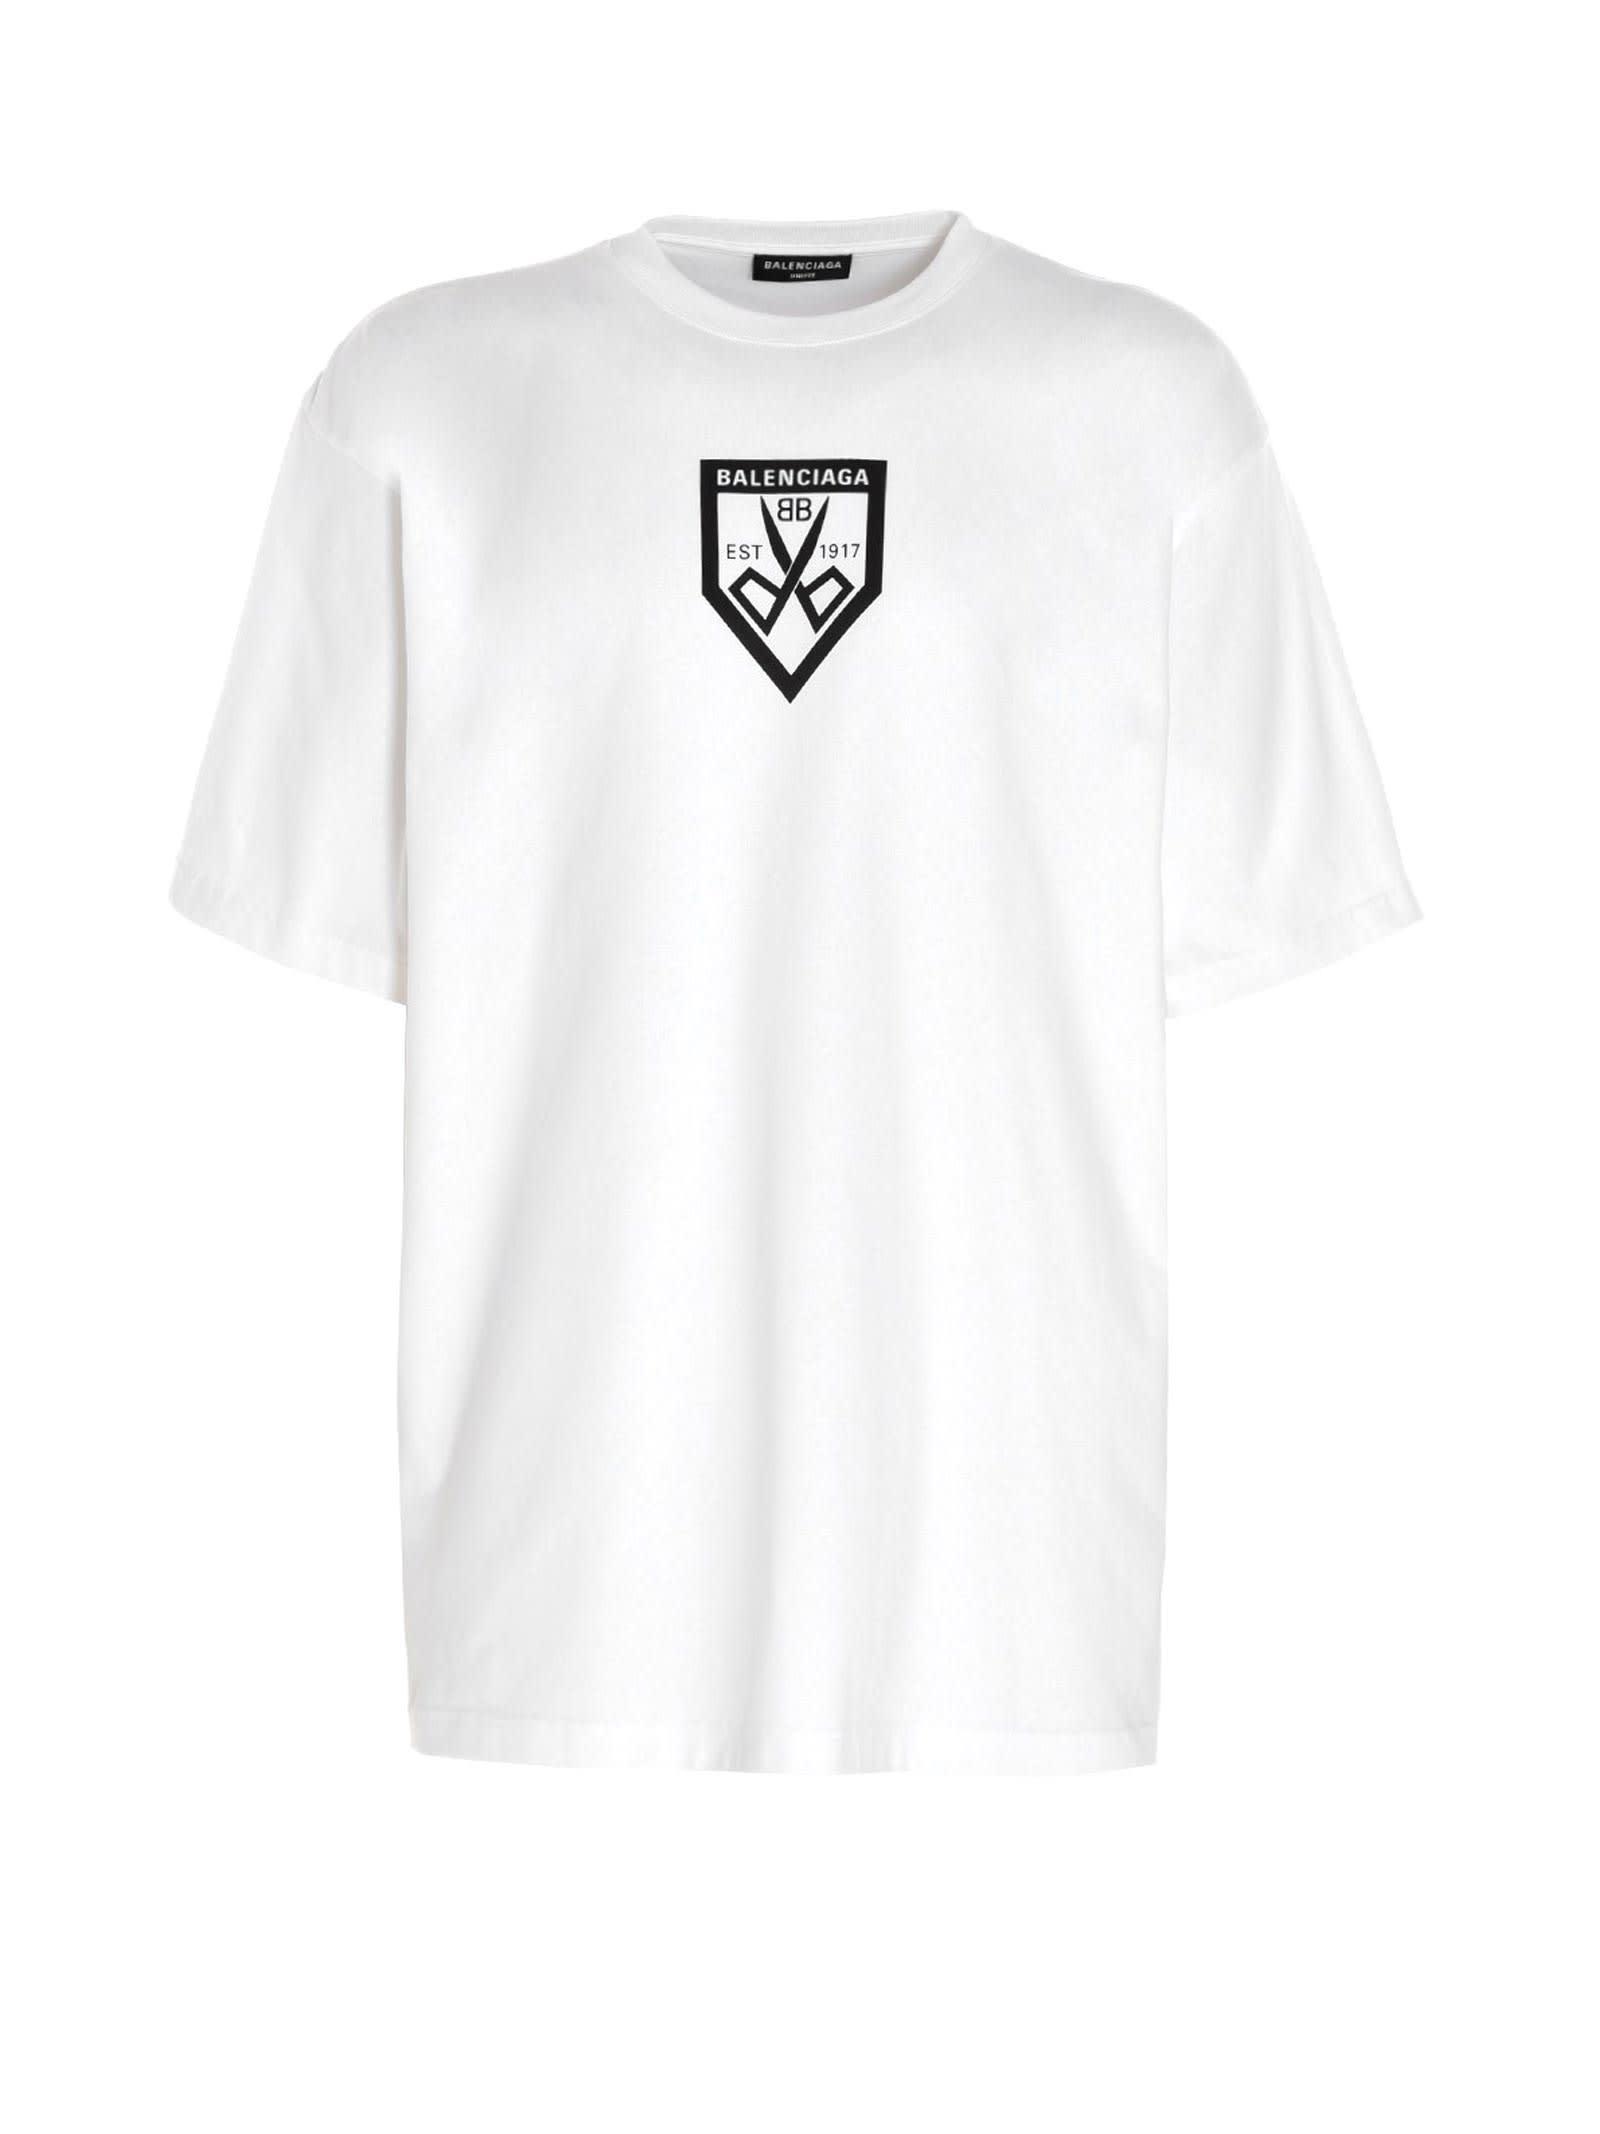 Balenciaga T-shirts LOGO T-SHIRT